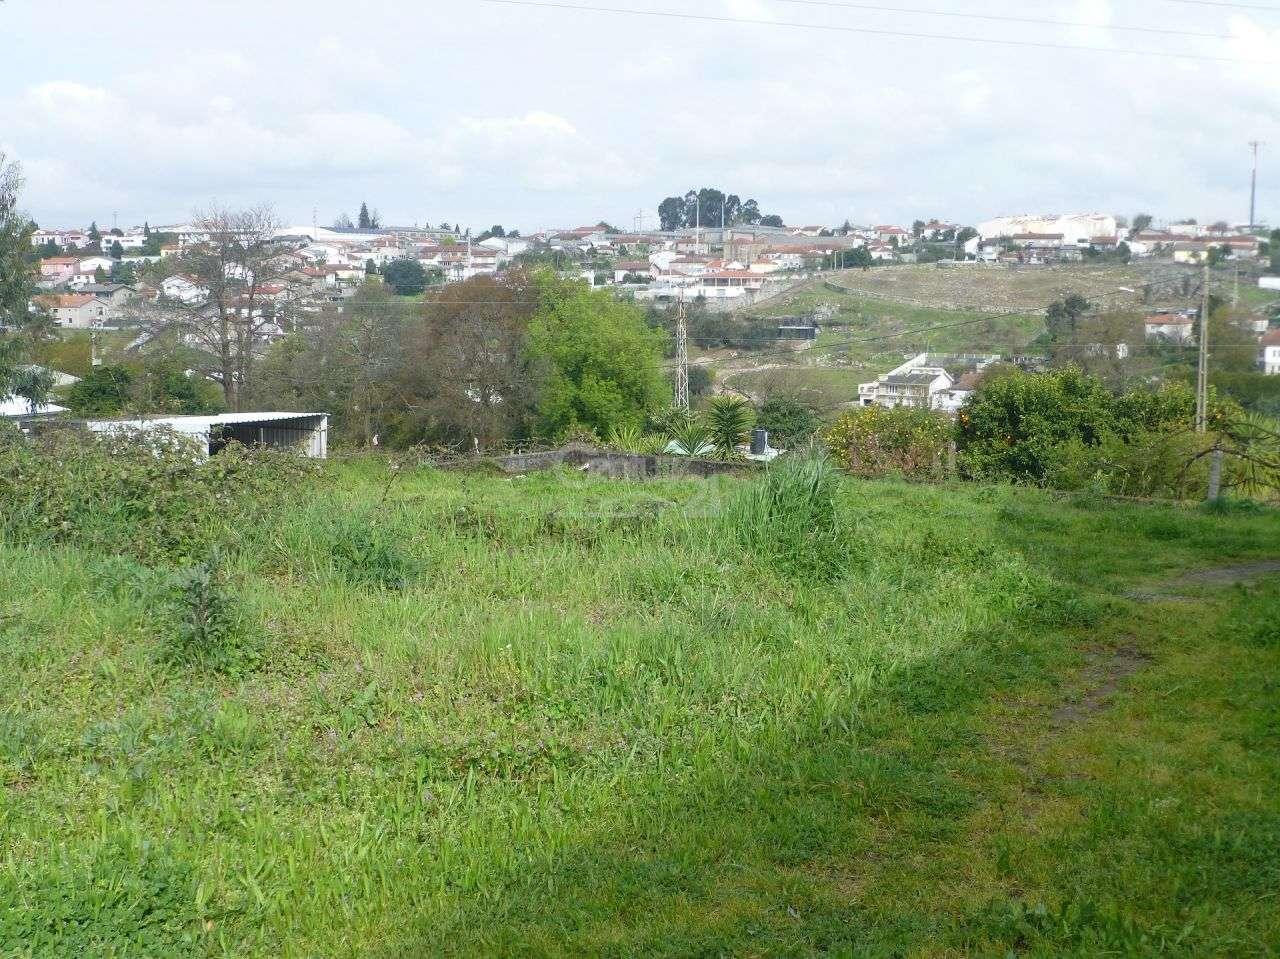 Terreno para comprar, Castêlo da Maia, Porto - Foto 4